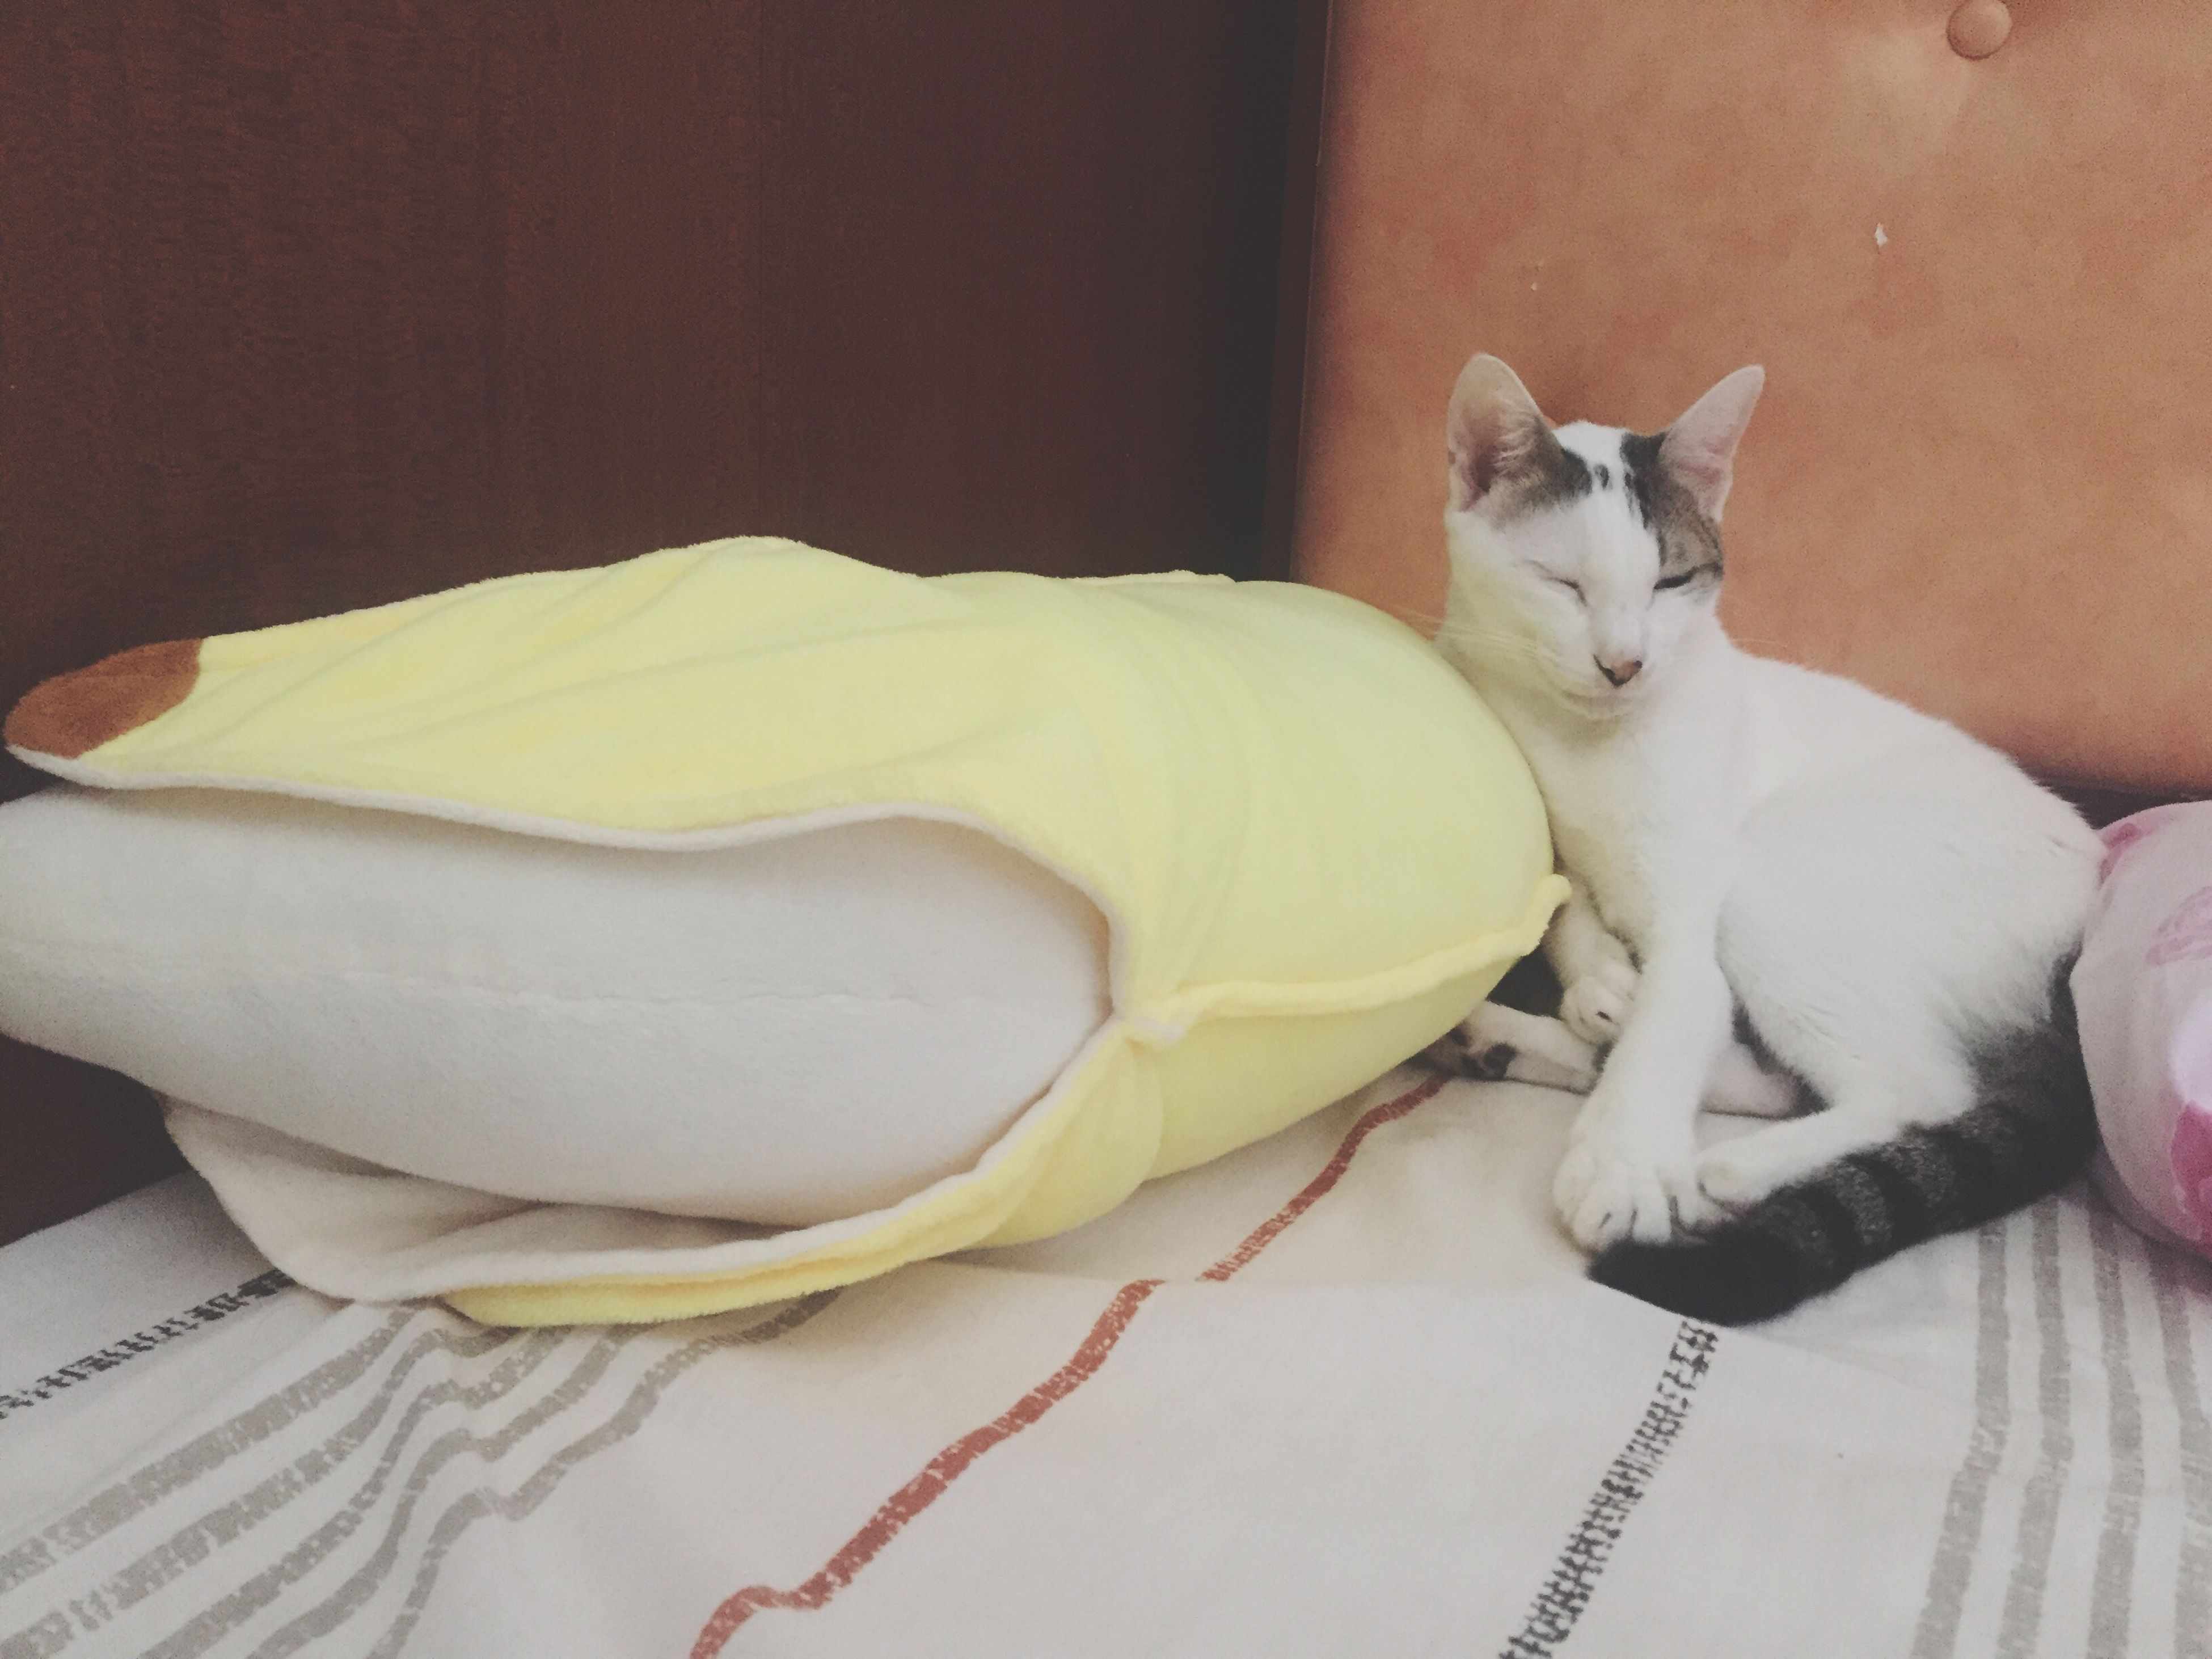 Banana or Cat ? Pets Cat Meow Banana Sleepy Storyonthebed Macau Macao